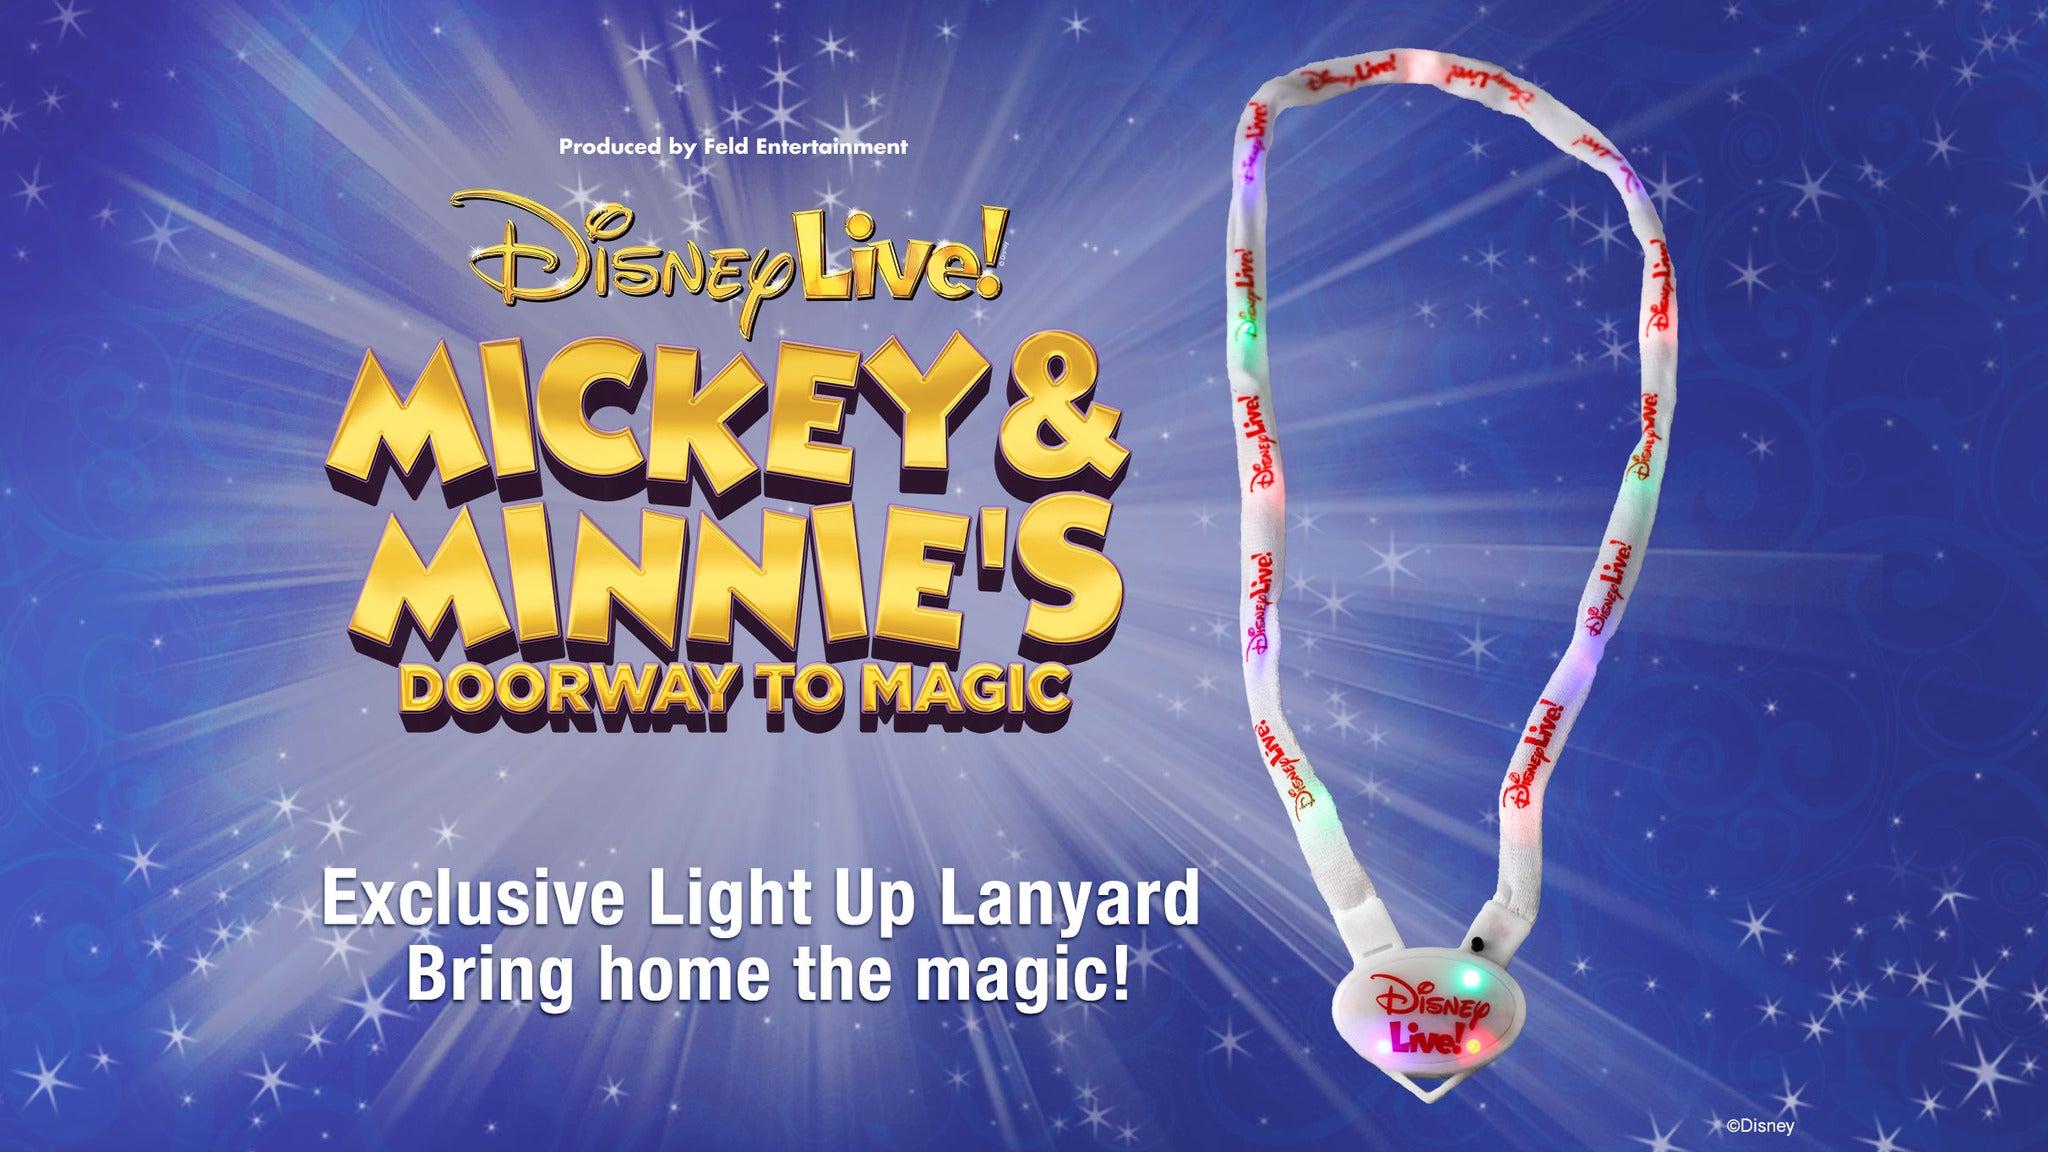 Disney Live! Mickey & Minnie's Doorway to Magic Light-Up Lanyard